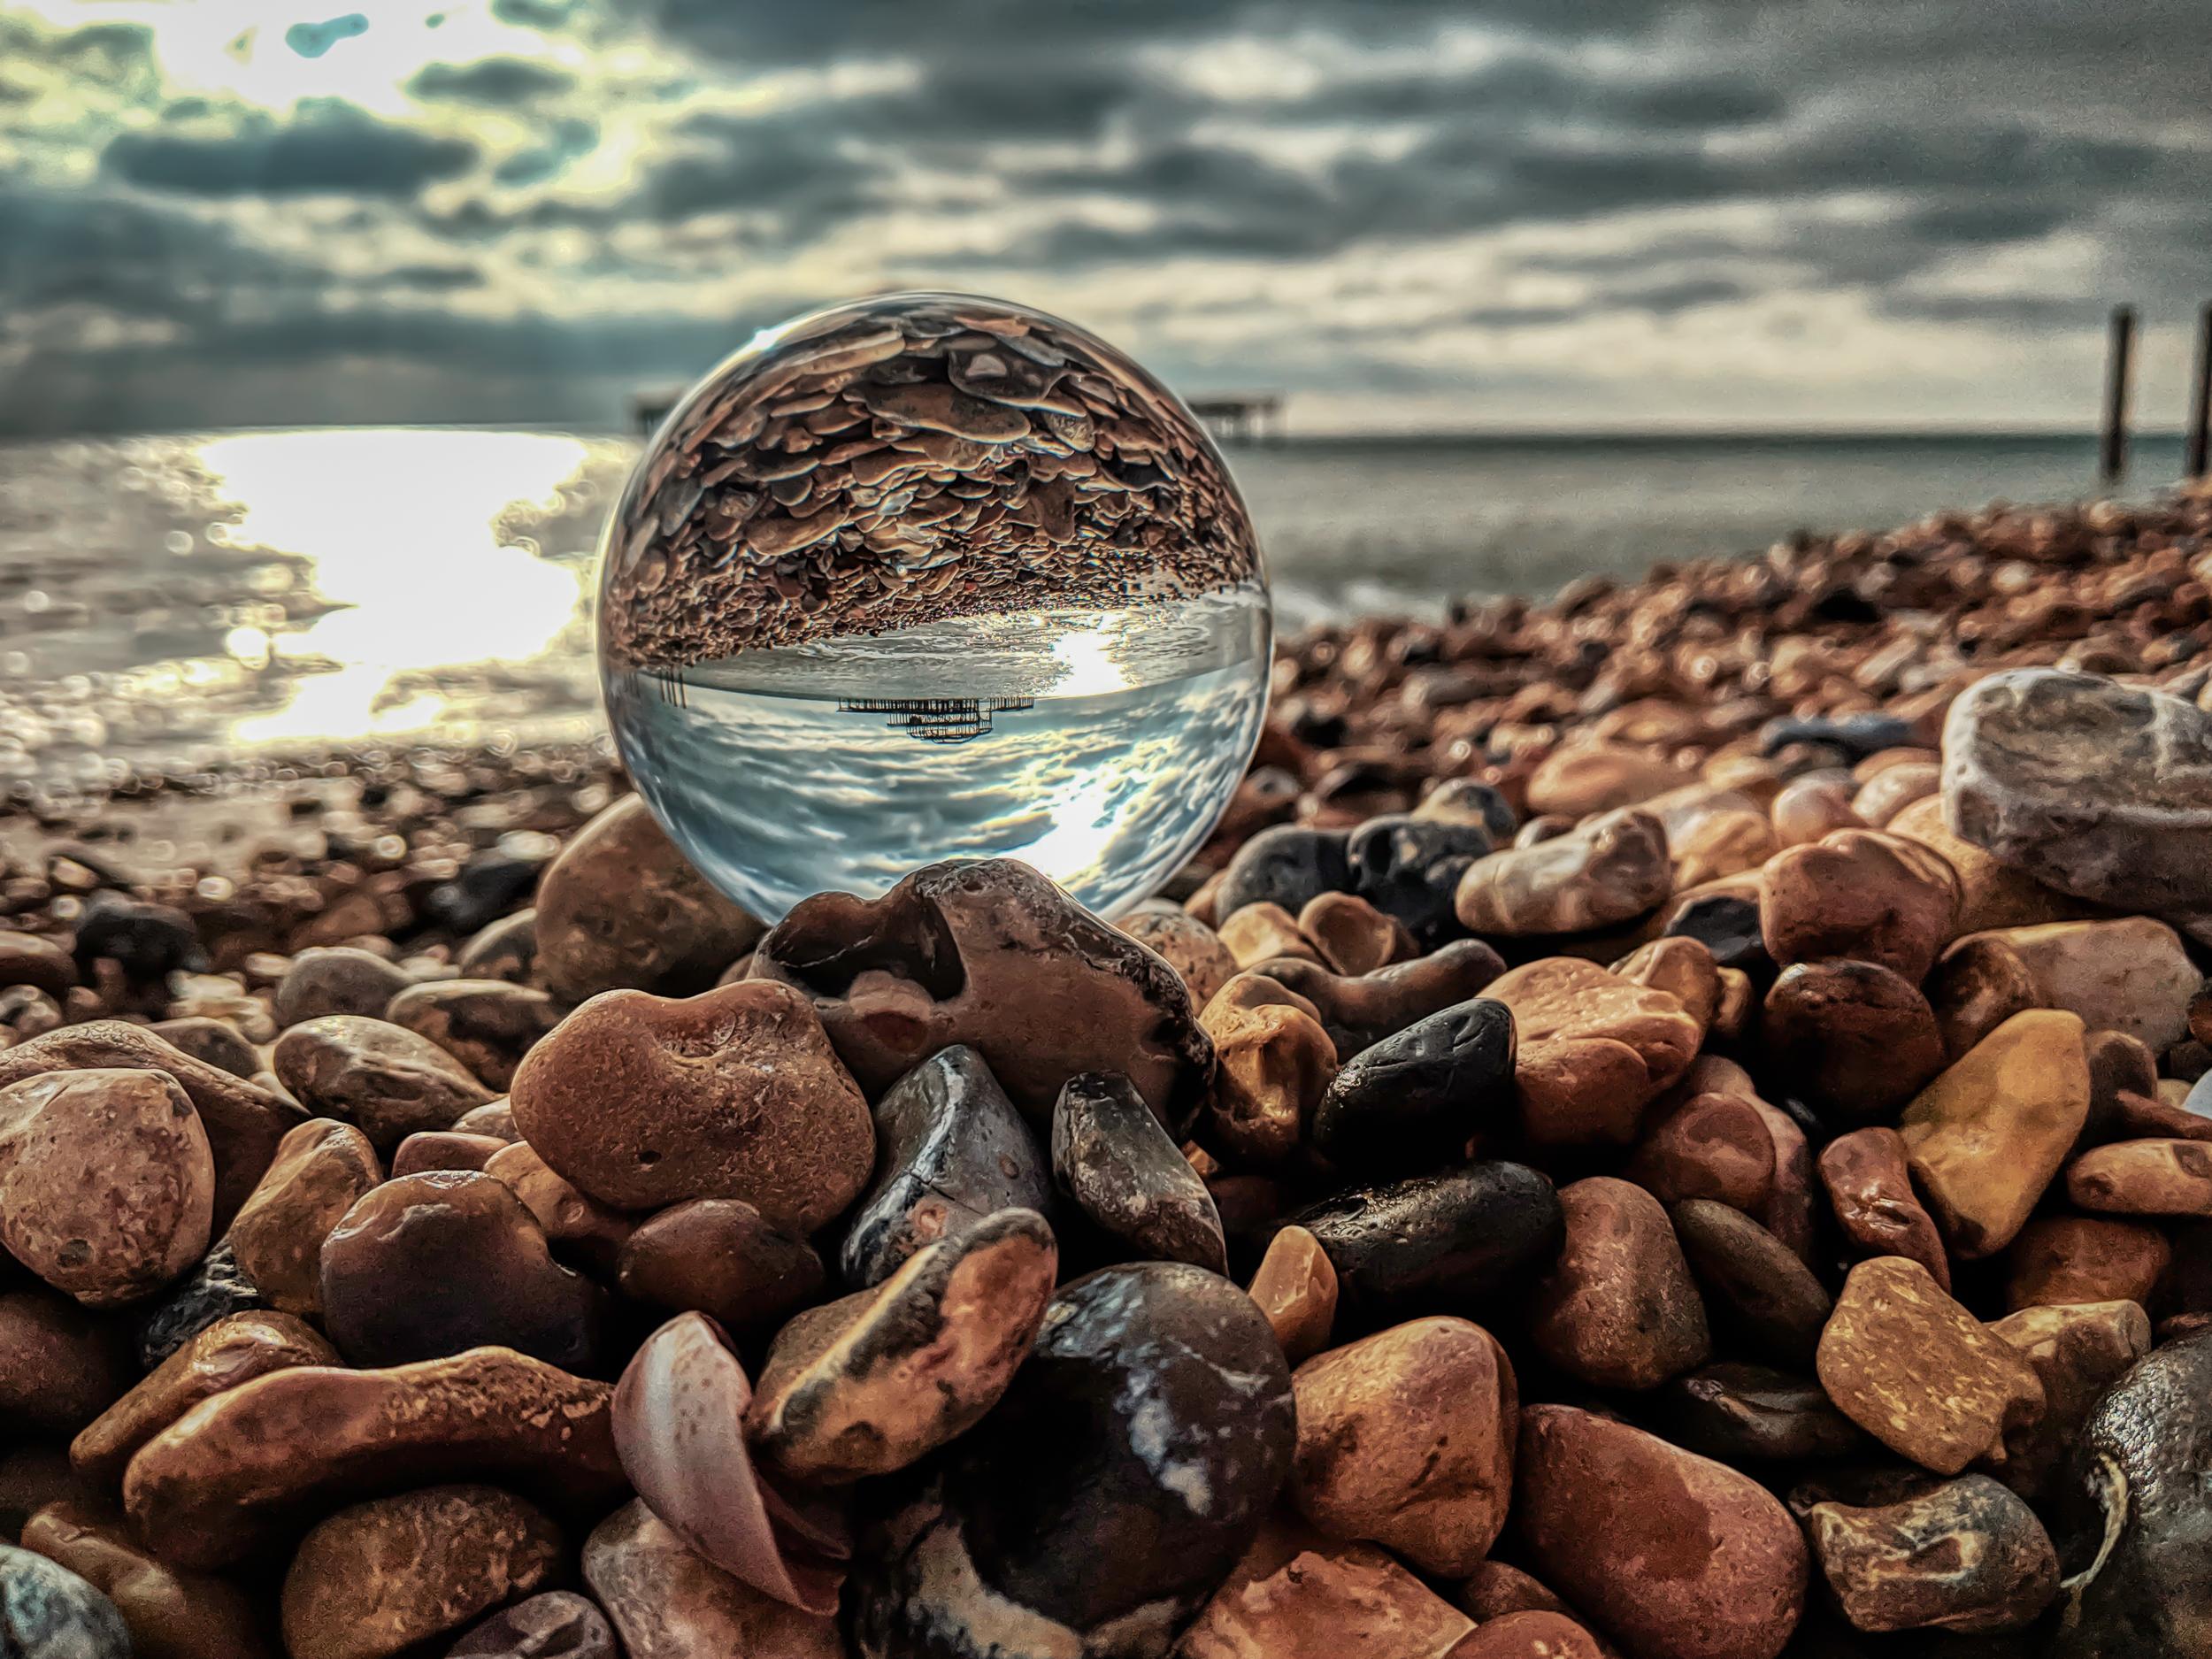 Brighton West Pier Lensball Photography